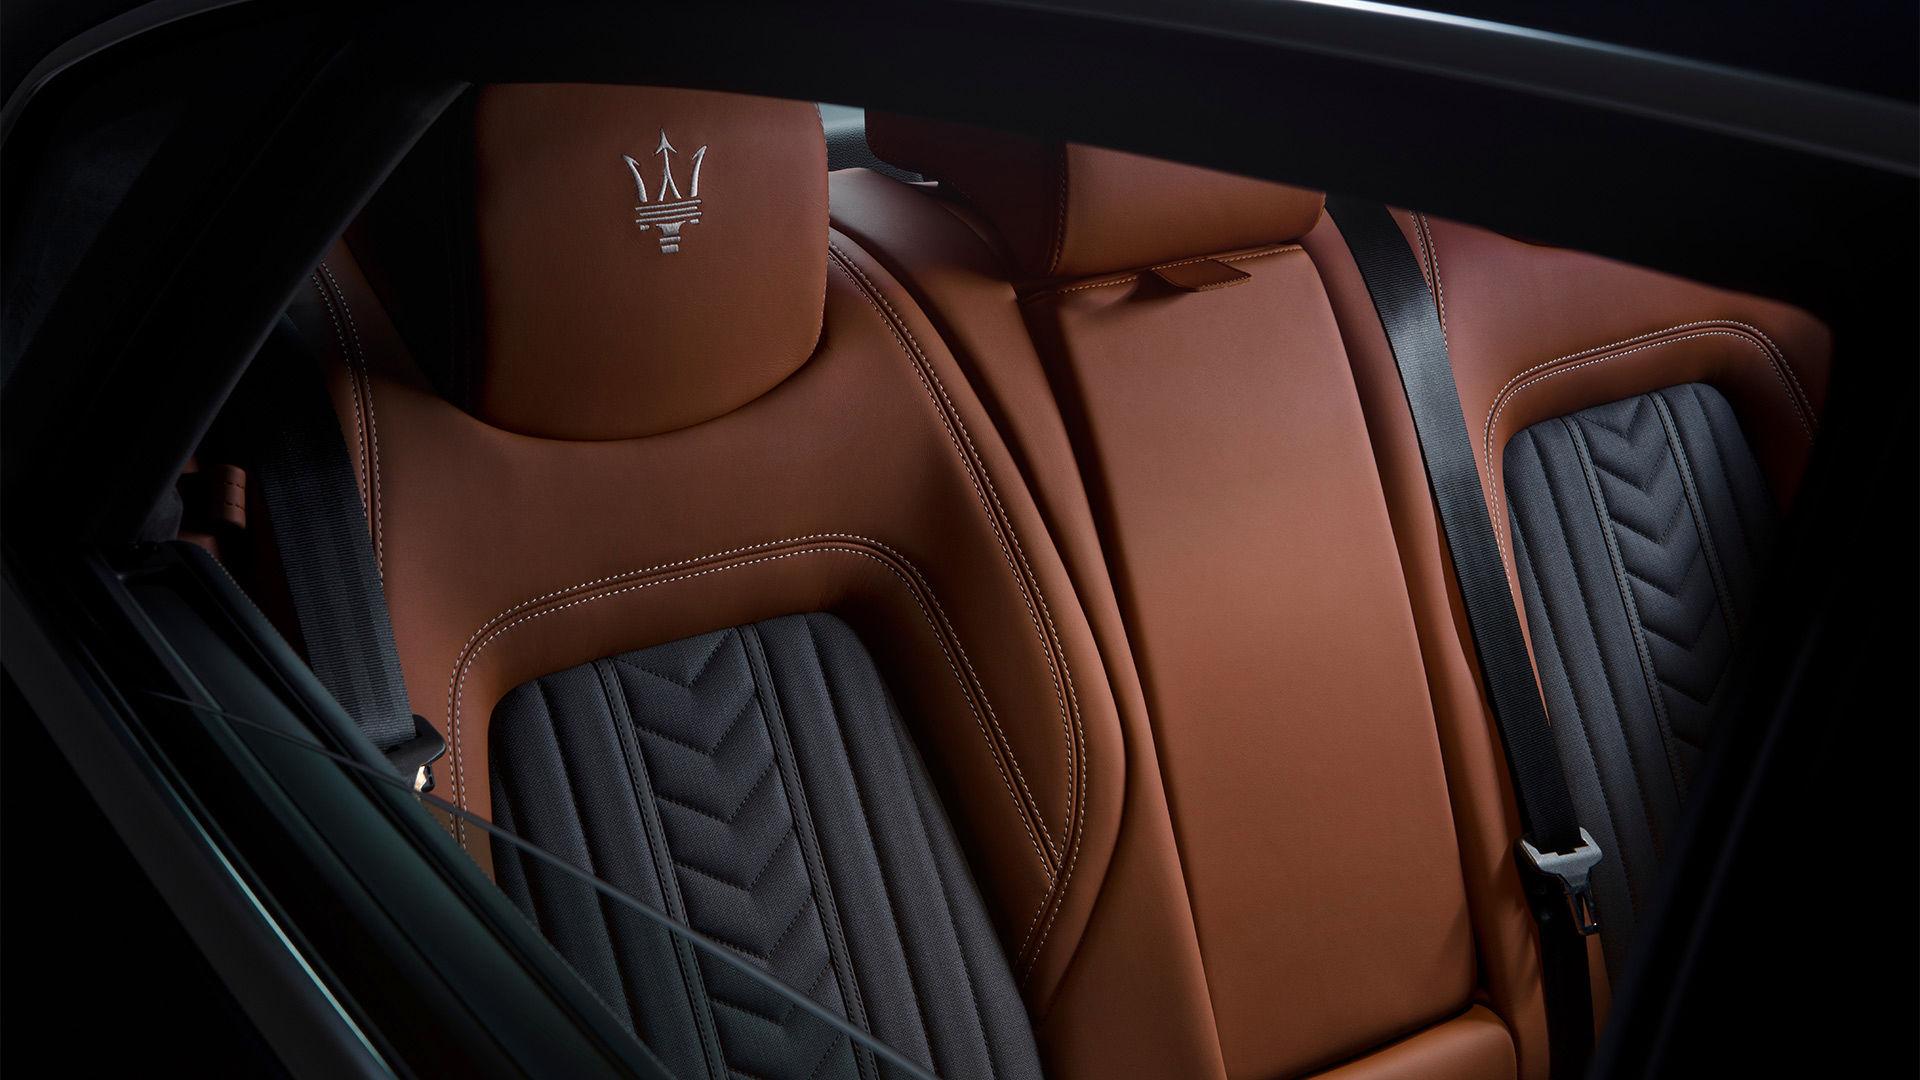 Maserati Quattroporte - Rückklappbare Ledersitze